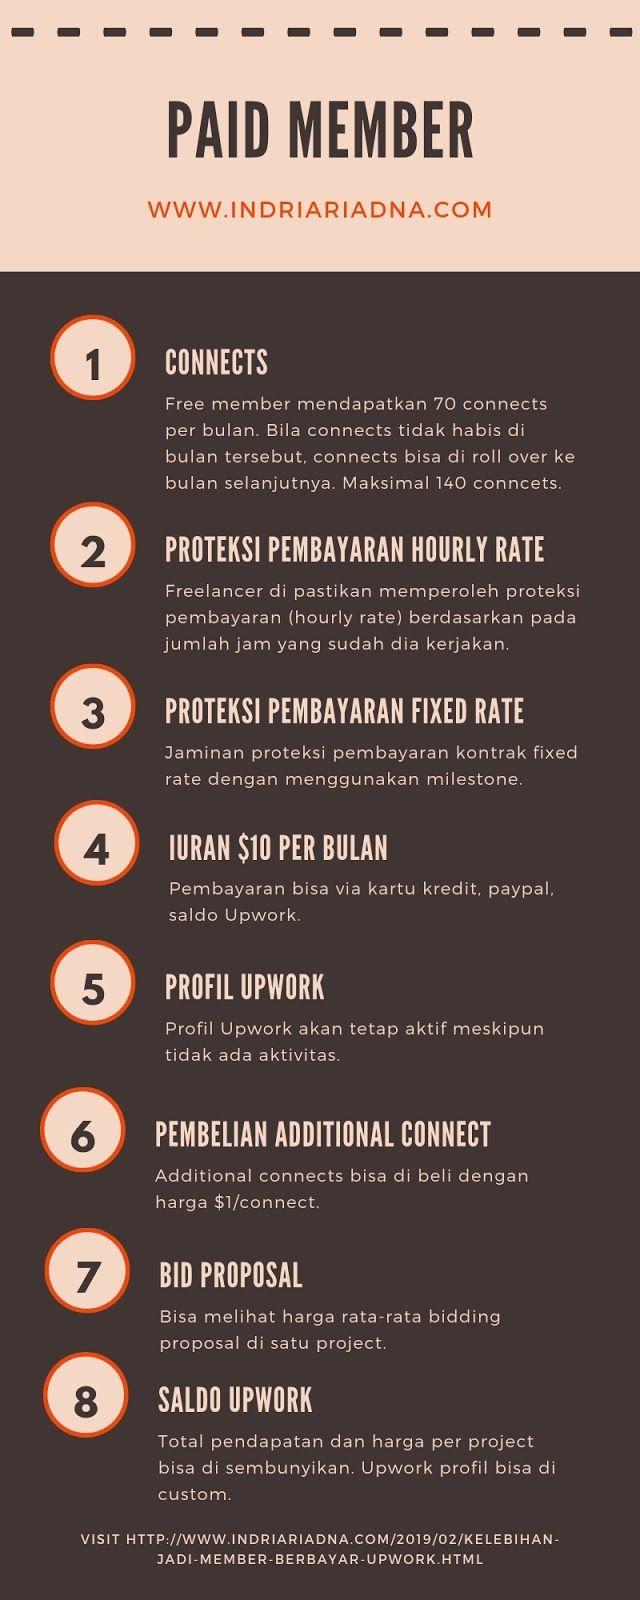 Ini Nih Manfaat Freelancer Plus Upwork Indri Ariadna Infografis